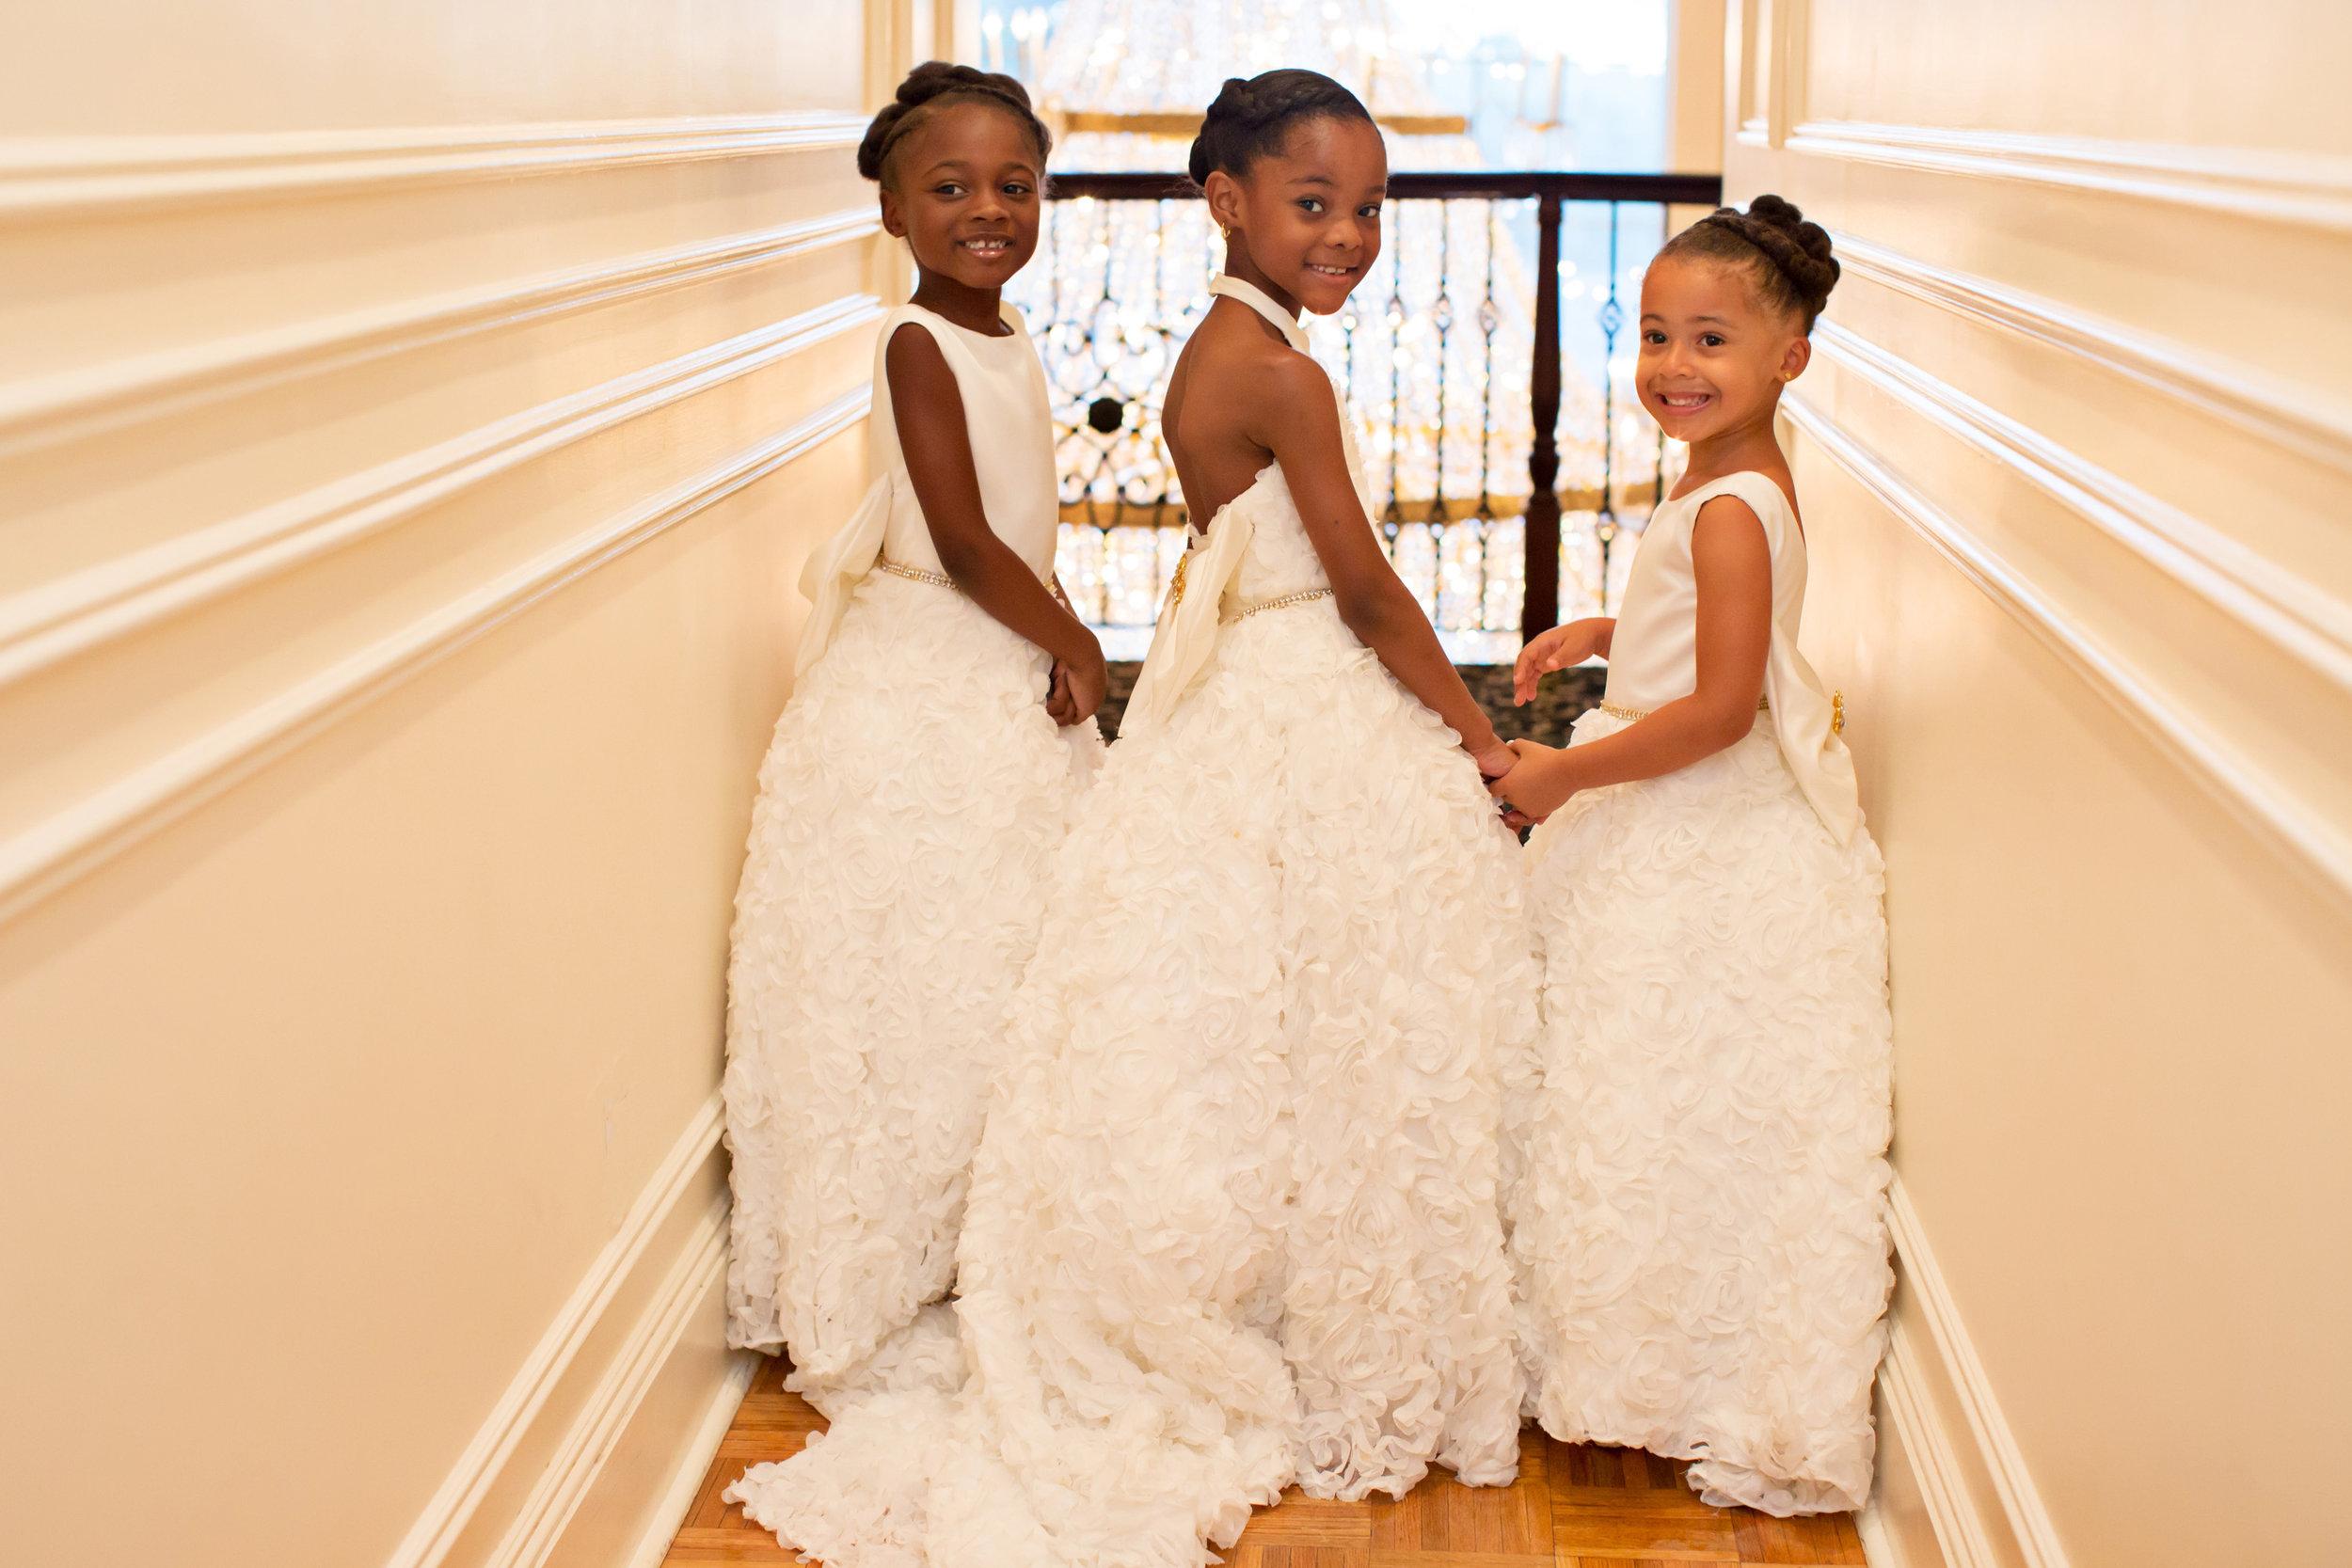 victorious-events-nyc-007-romie-kamali-tides-estate-wedding-nana-annan.jpg